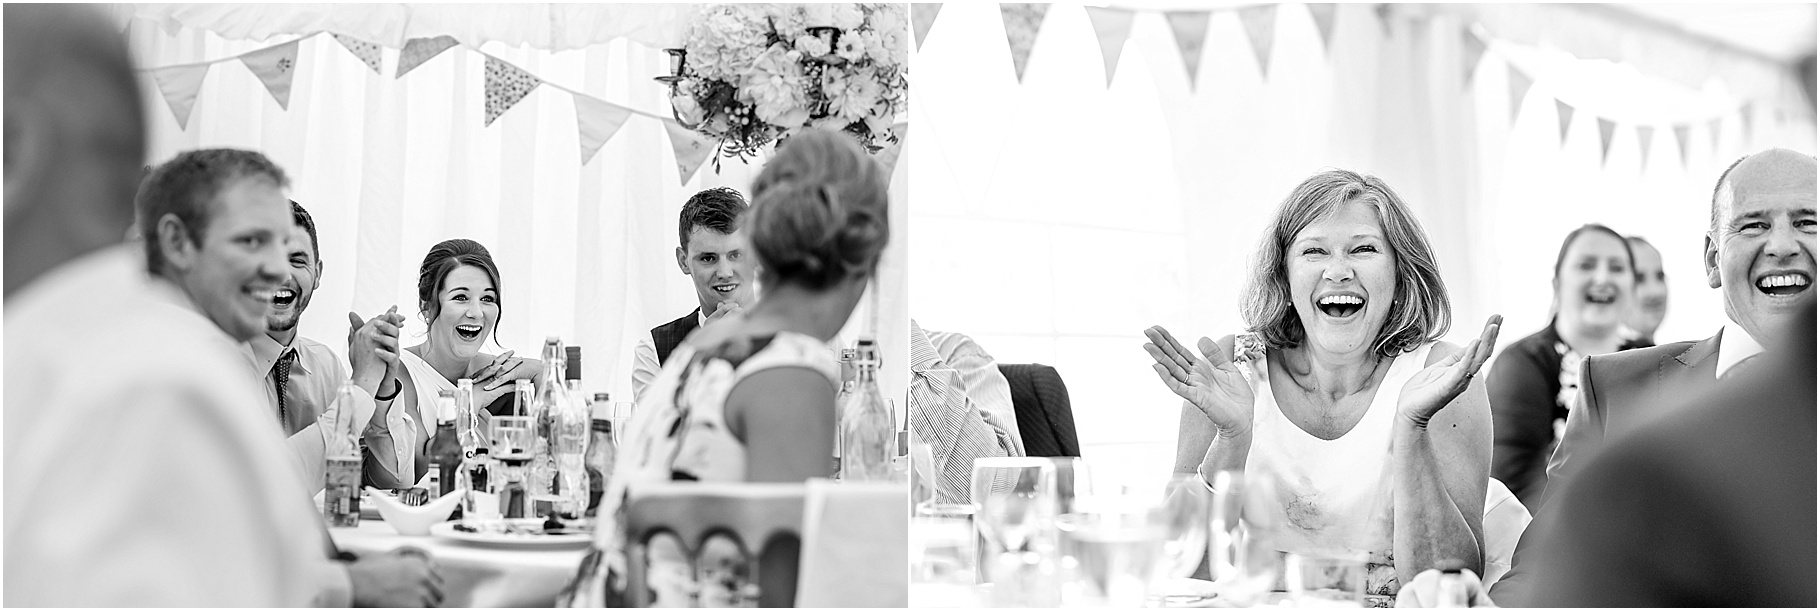 lancashire-marquee-wedding-062.jpg